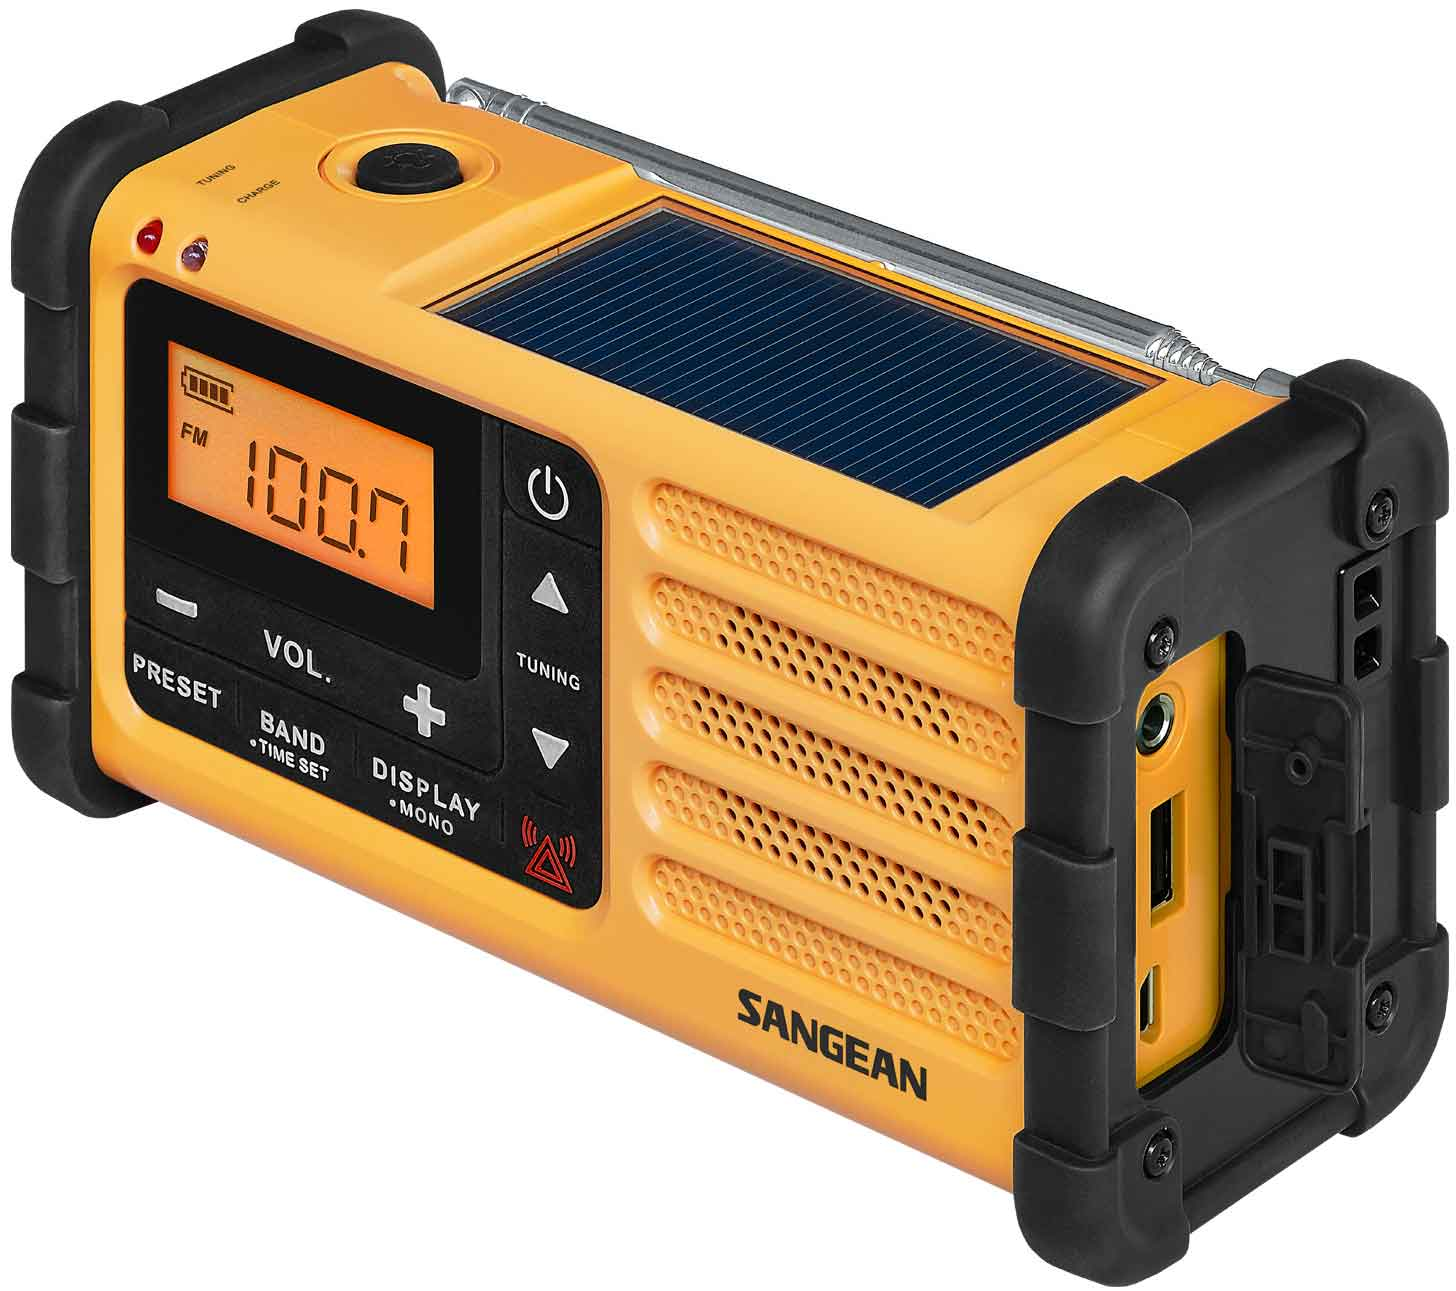 Sangean Solar power FM/AM